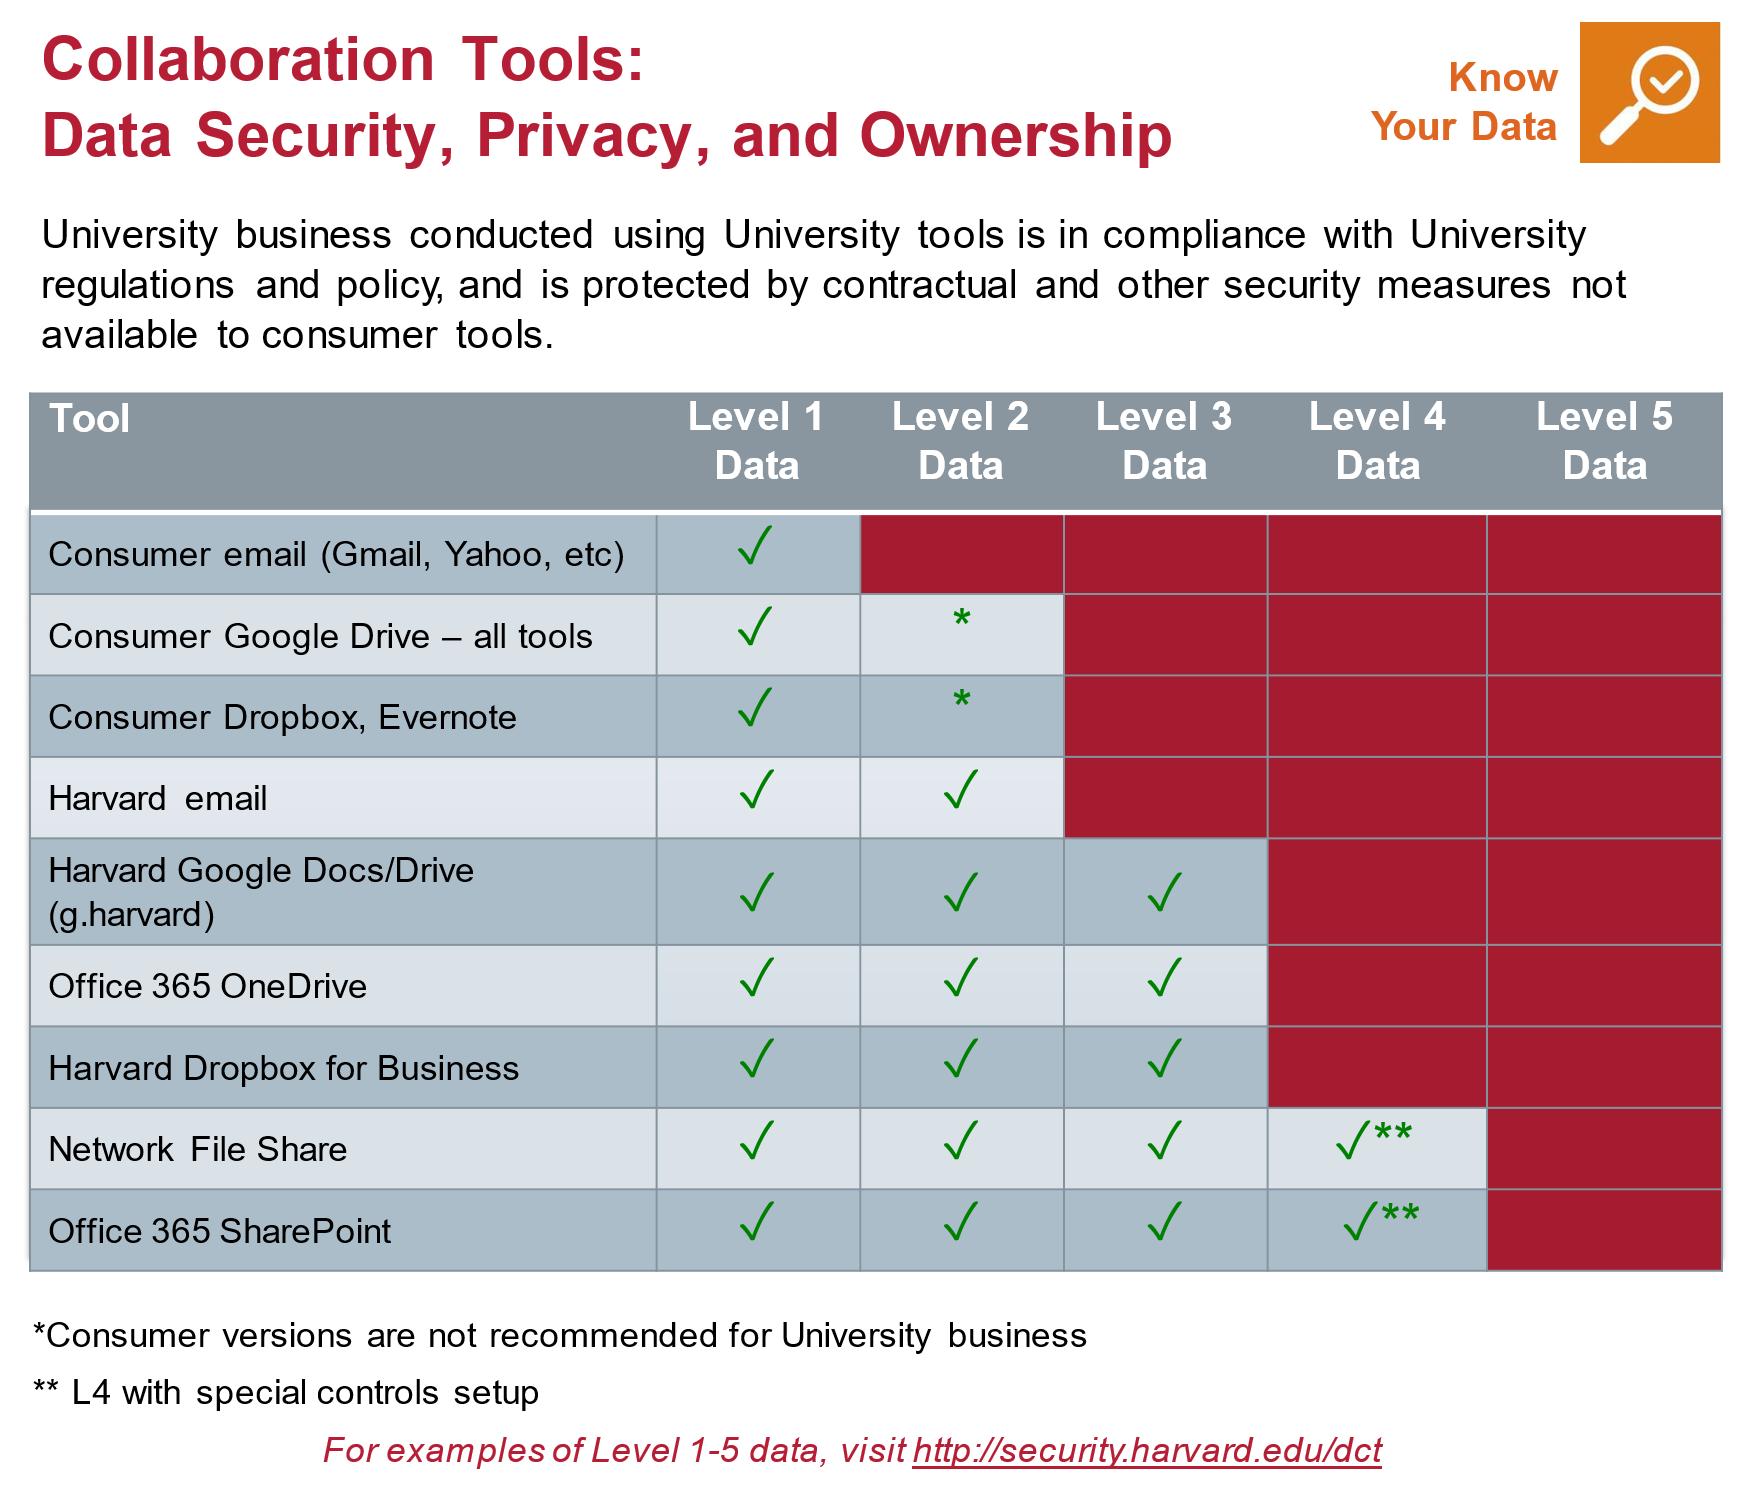 Collaboration Tools Matrix | Information Security